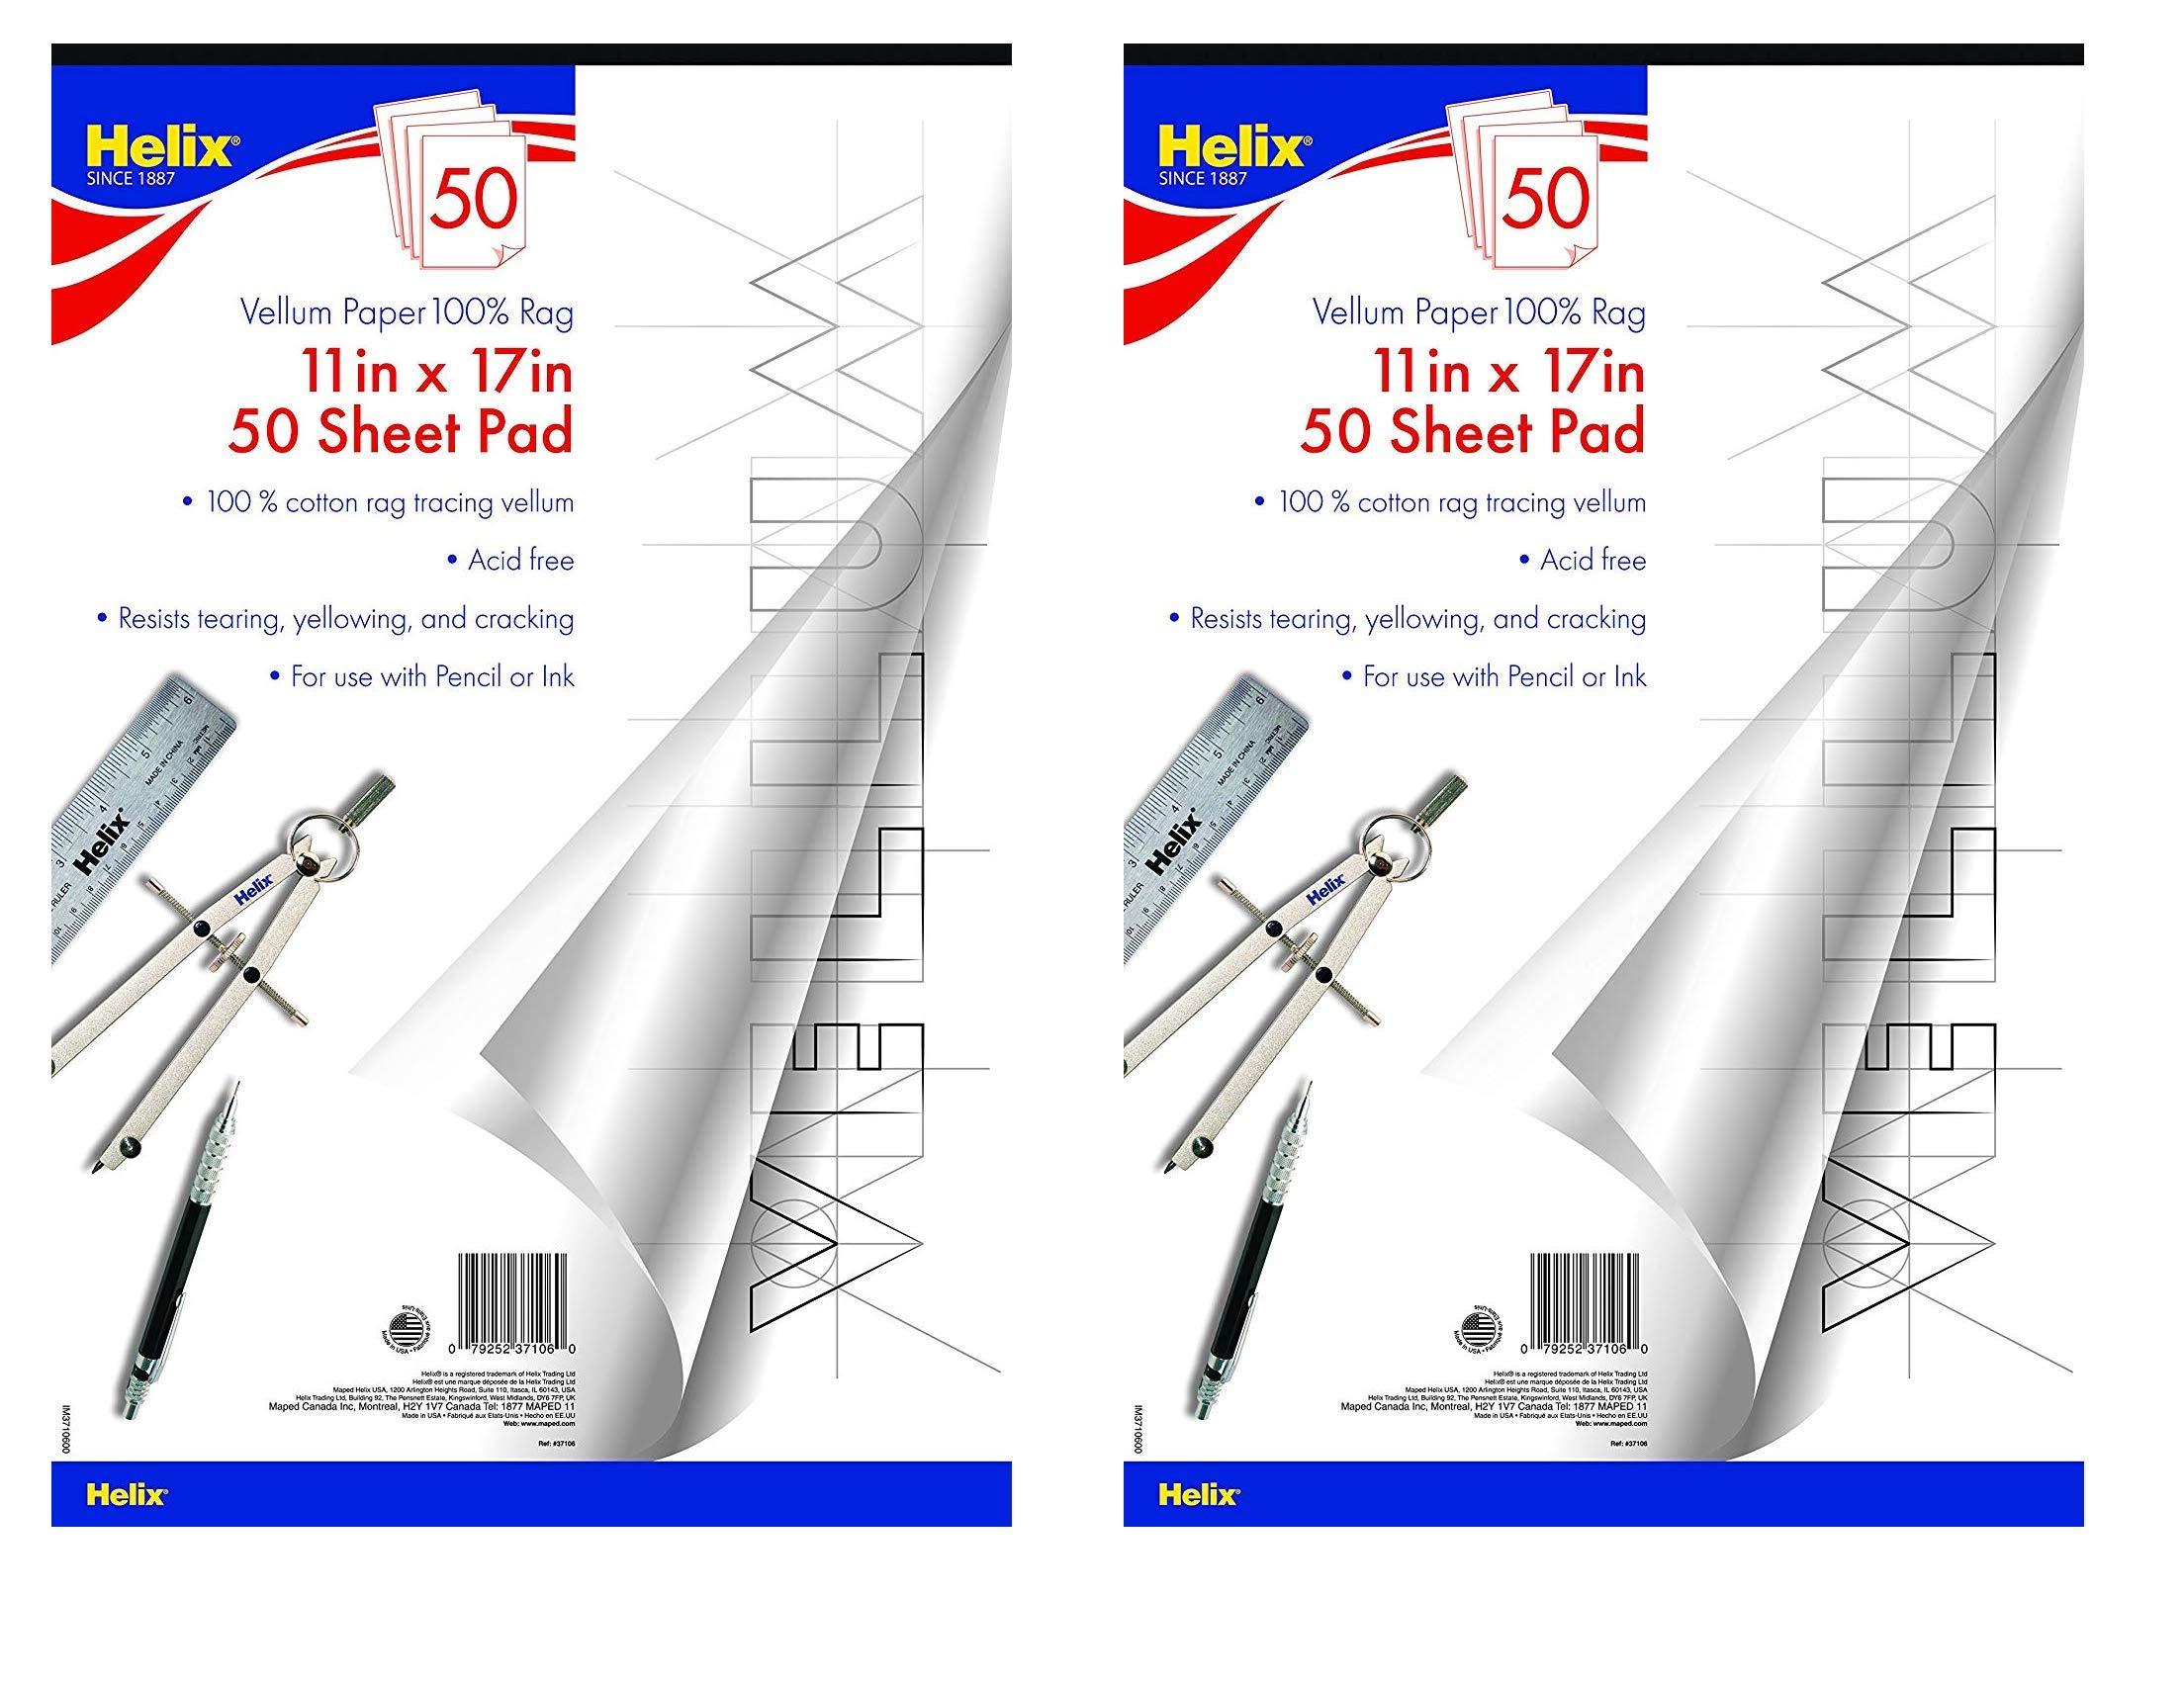 Helix Vellum Paper Pad, 100% Rag, 11 x 17 inch, 50 Sheets (37106) (2-Pack)